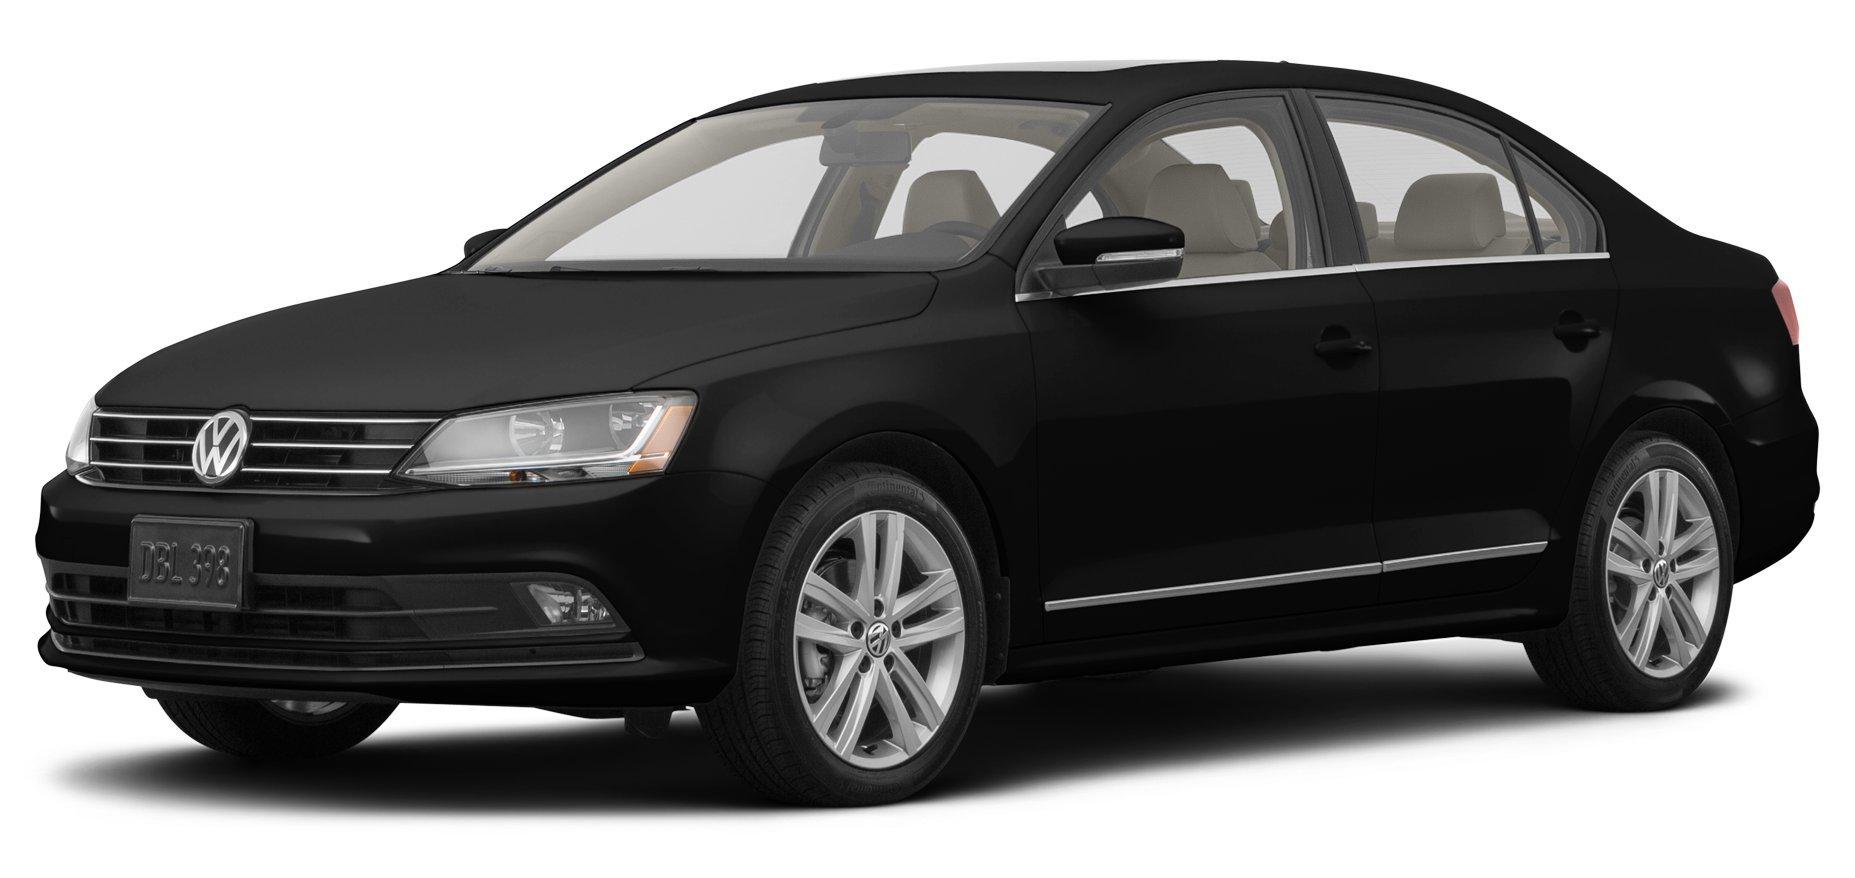 2017 Nissan Sentra NISMO, CVT, 2017 Volkswagen Jetta 1.8T SEL, Automatic Transmission ...